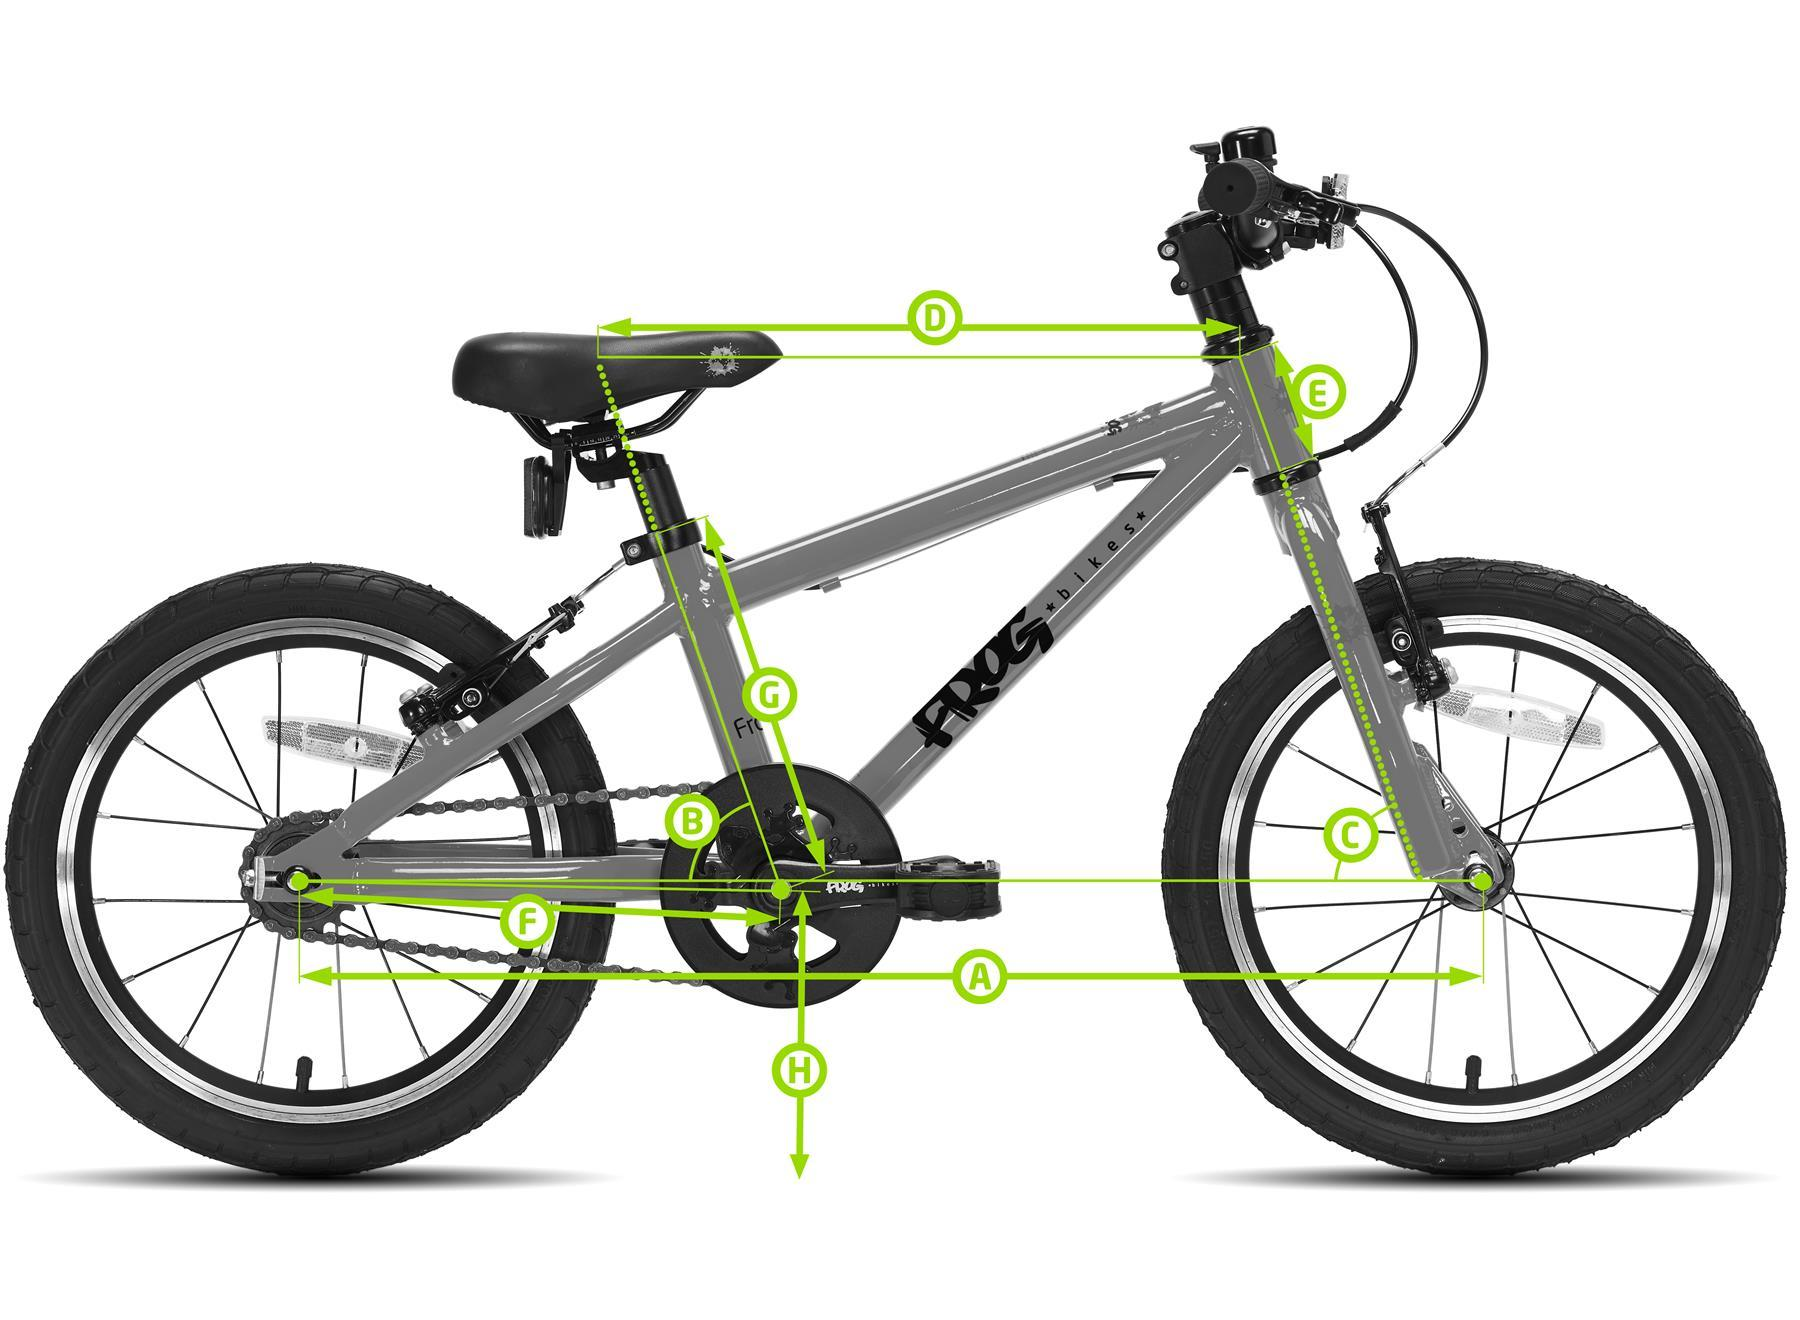 Frog First Pedal 40 Bike Geometry